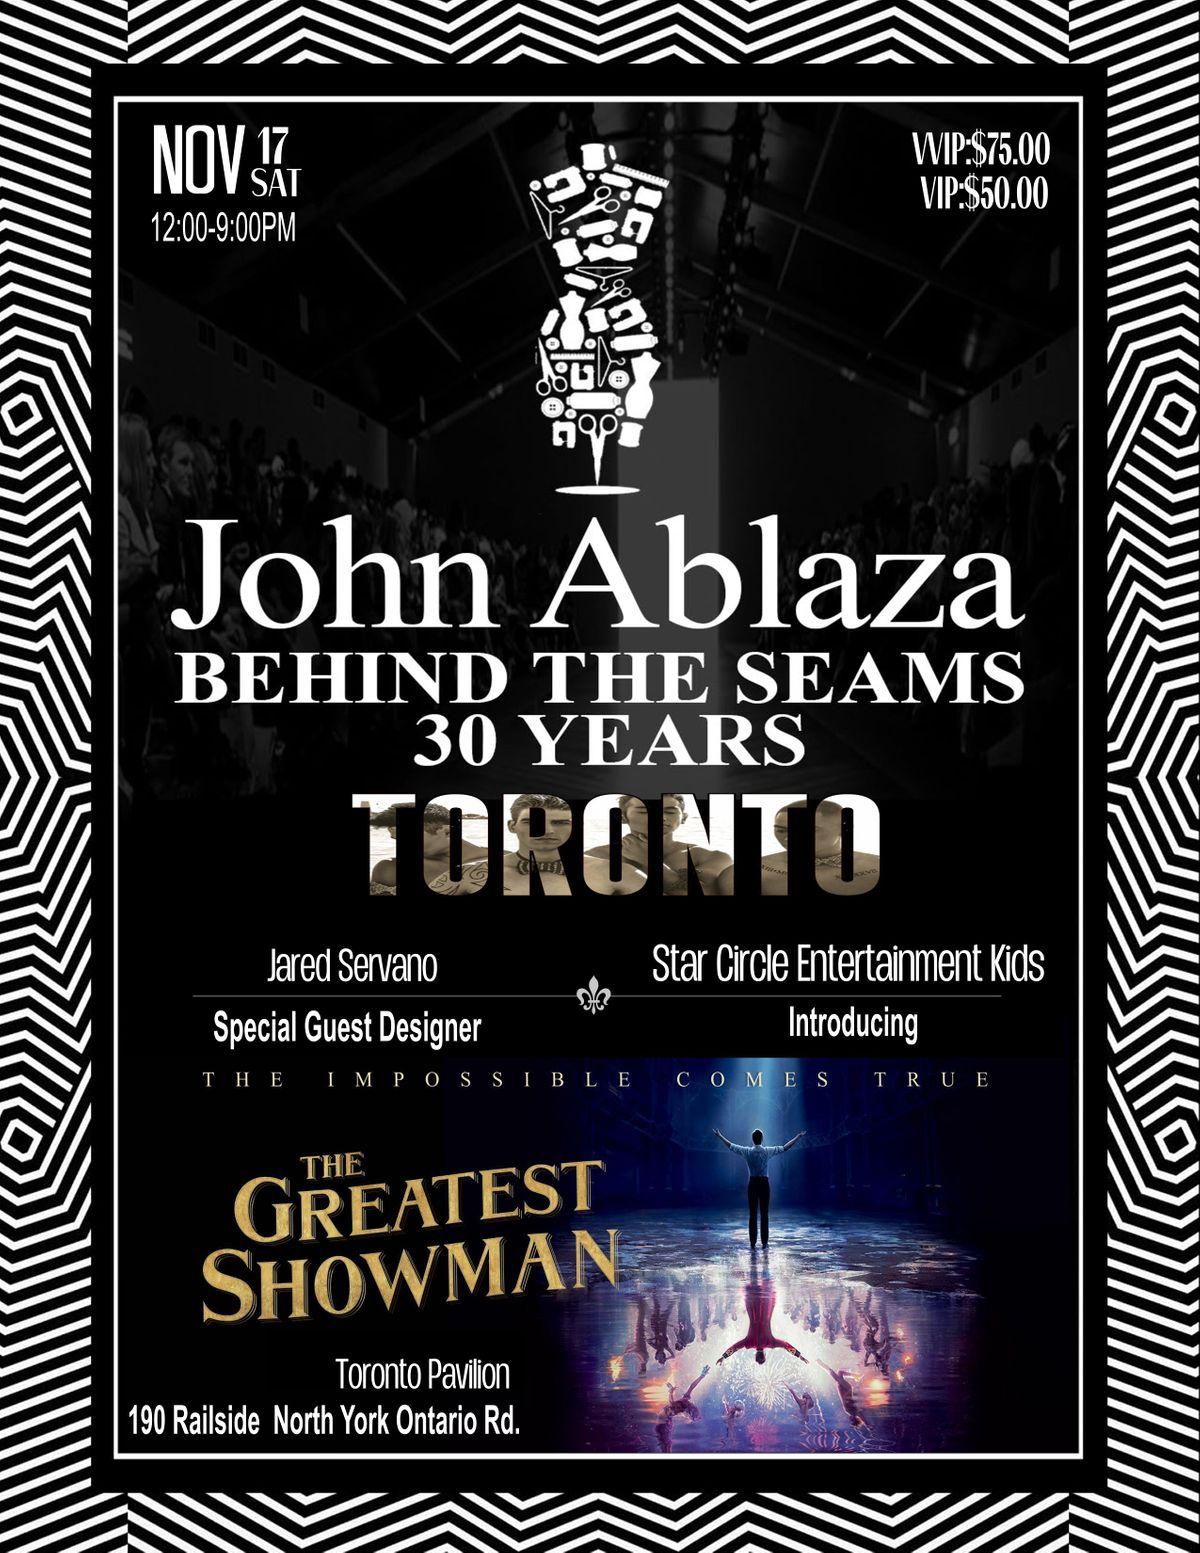 John Ablazas Behind the Seams Fashionshow